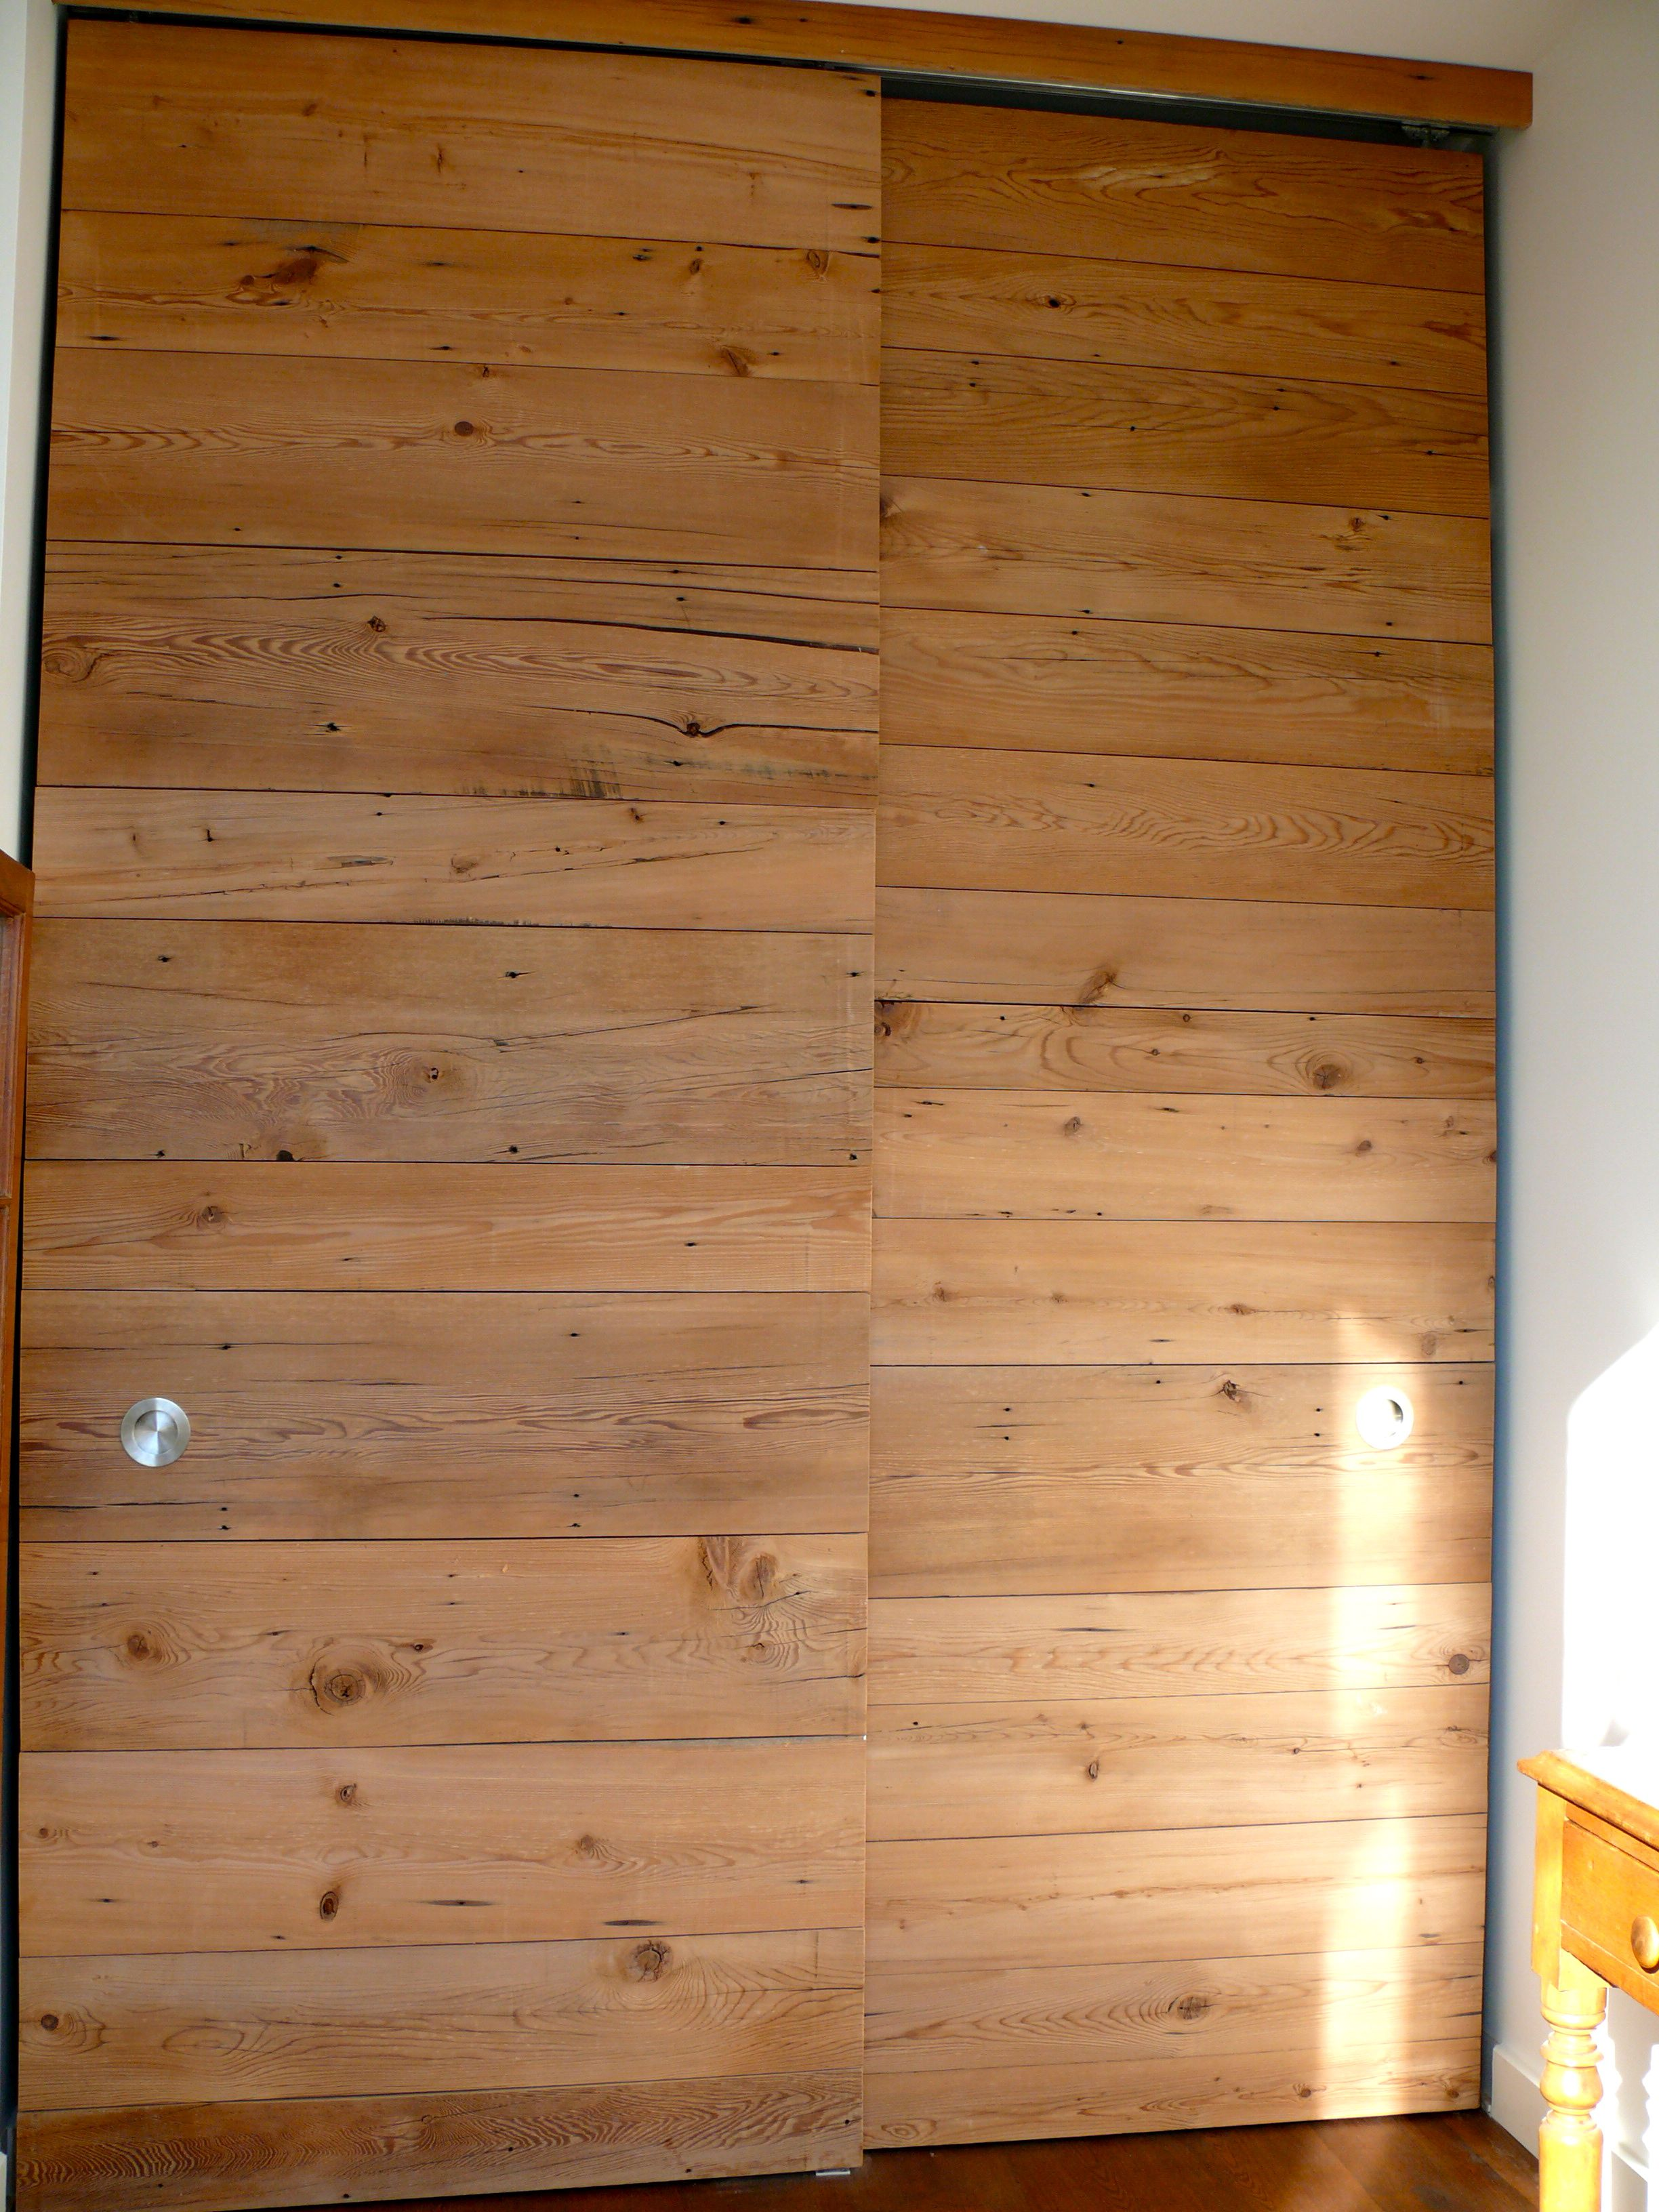 pine closet doors on image detail for re milled pine as floor to ceiling sliding closet doors schiebeschrankturen turen und boden schiebeturenschrank selber bauen pinterest